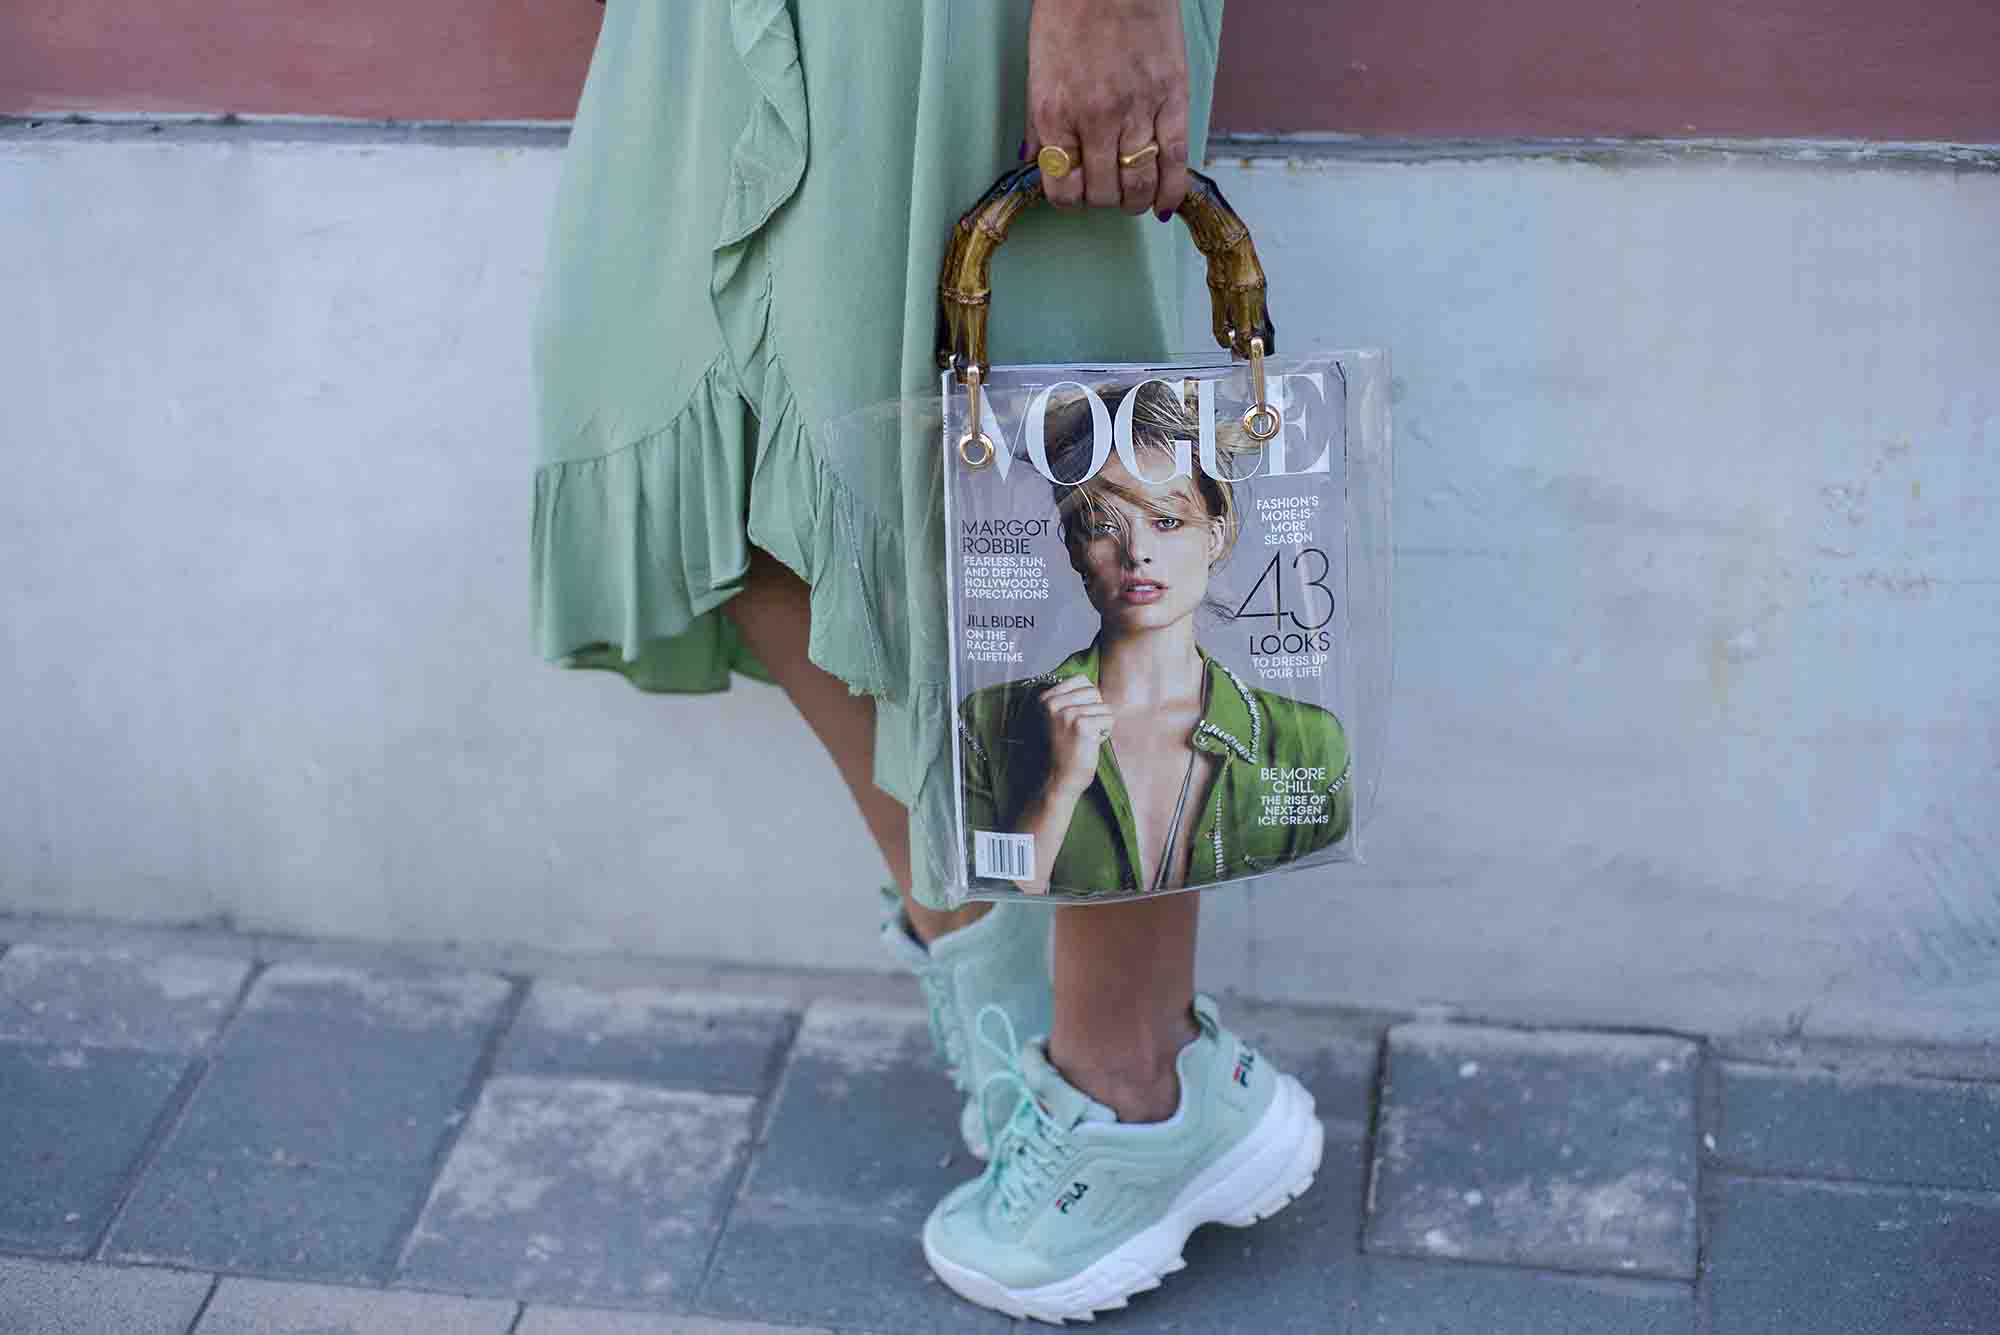 Fashion Israel-מגזין אופנה ישראלי, שגית שליו, צילום לימור יערי - 66